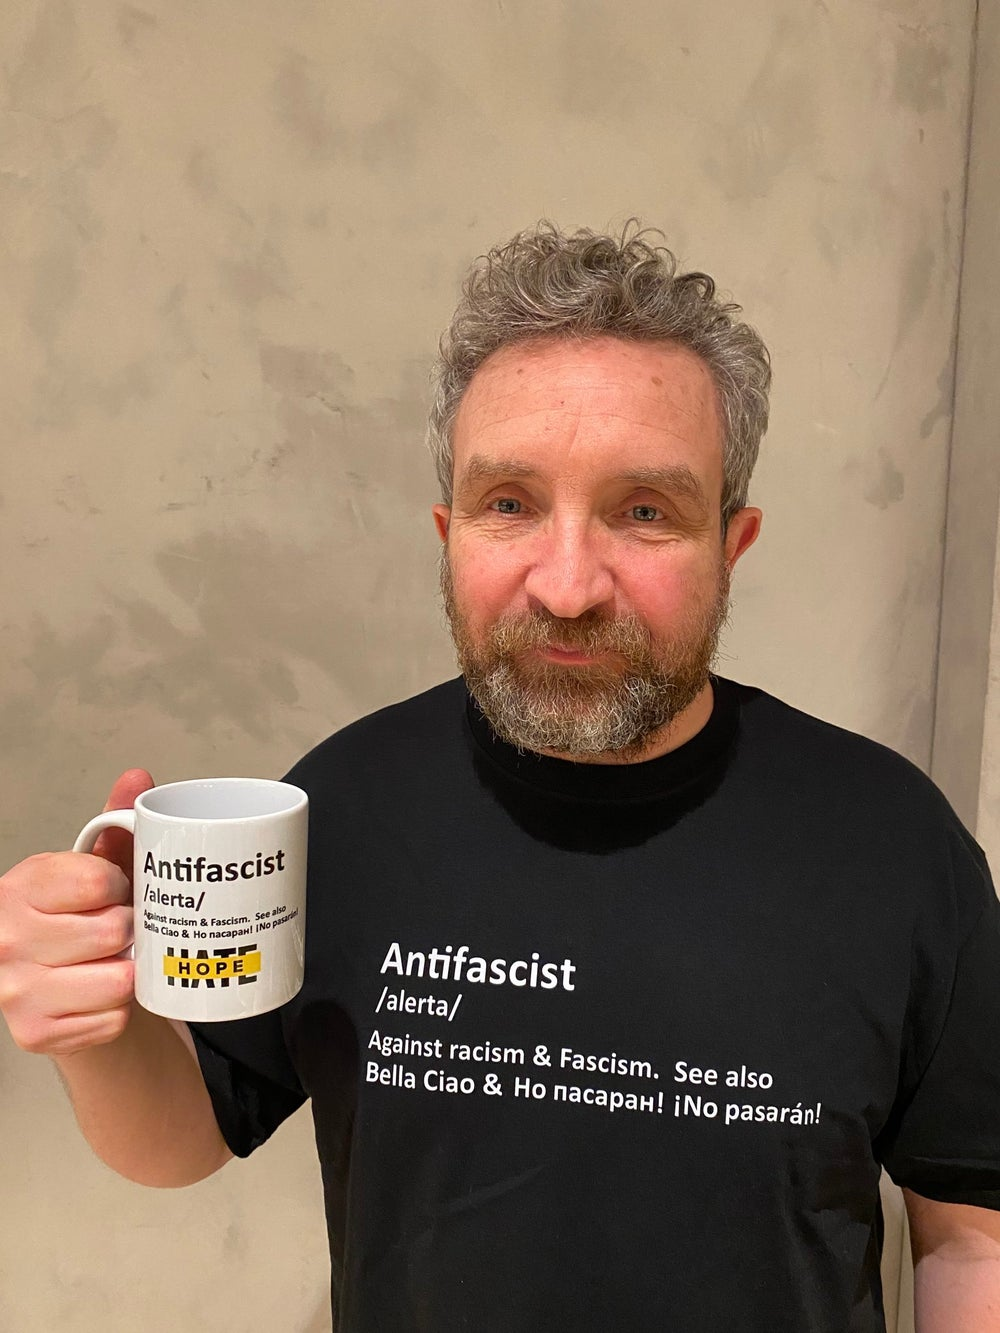 Phonetic Antifascist